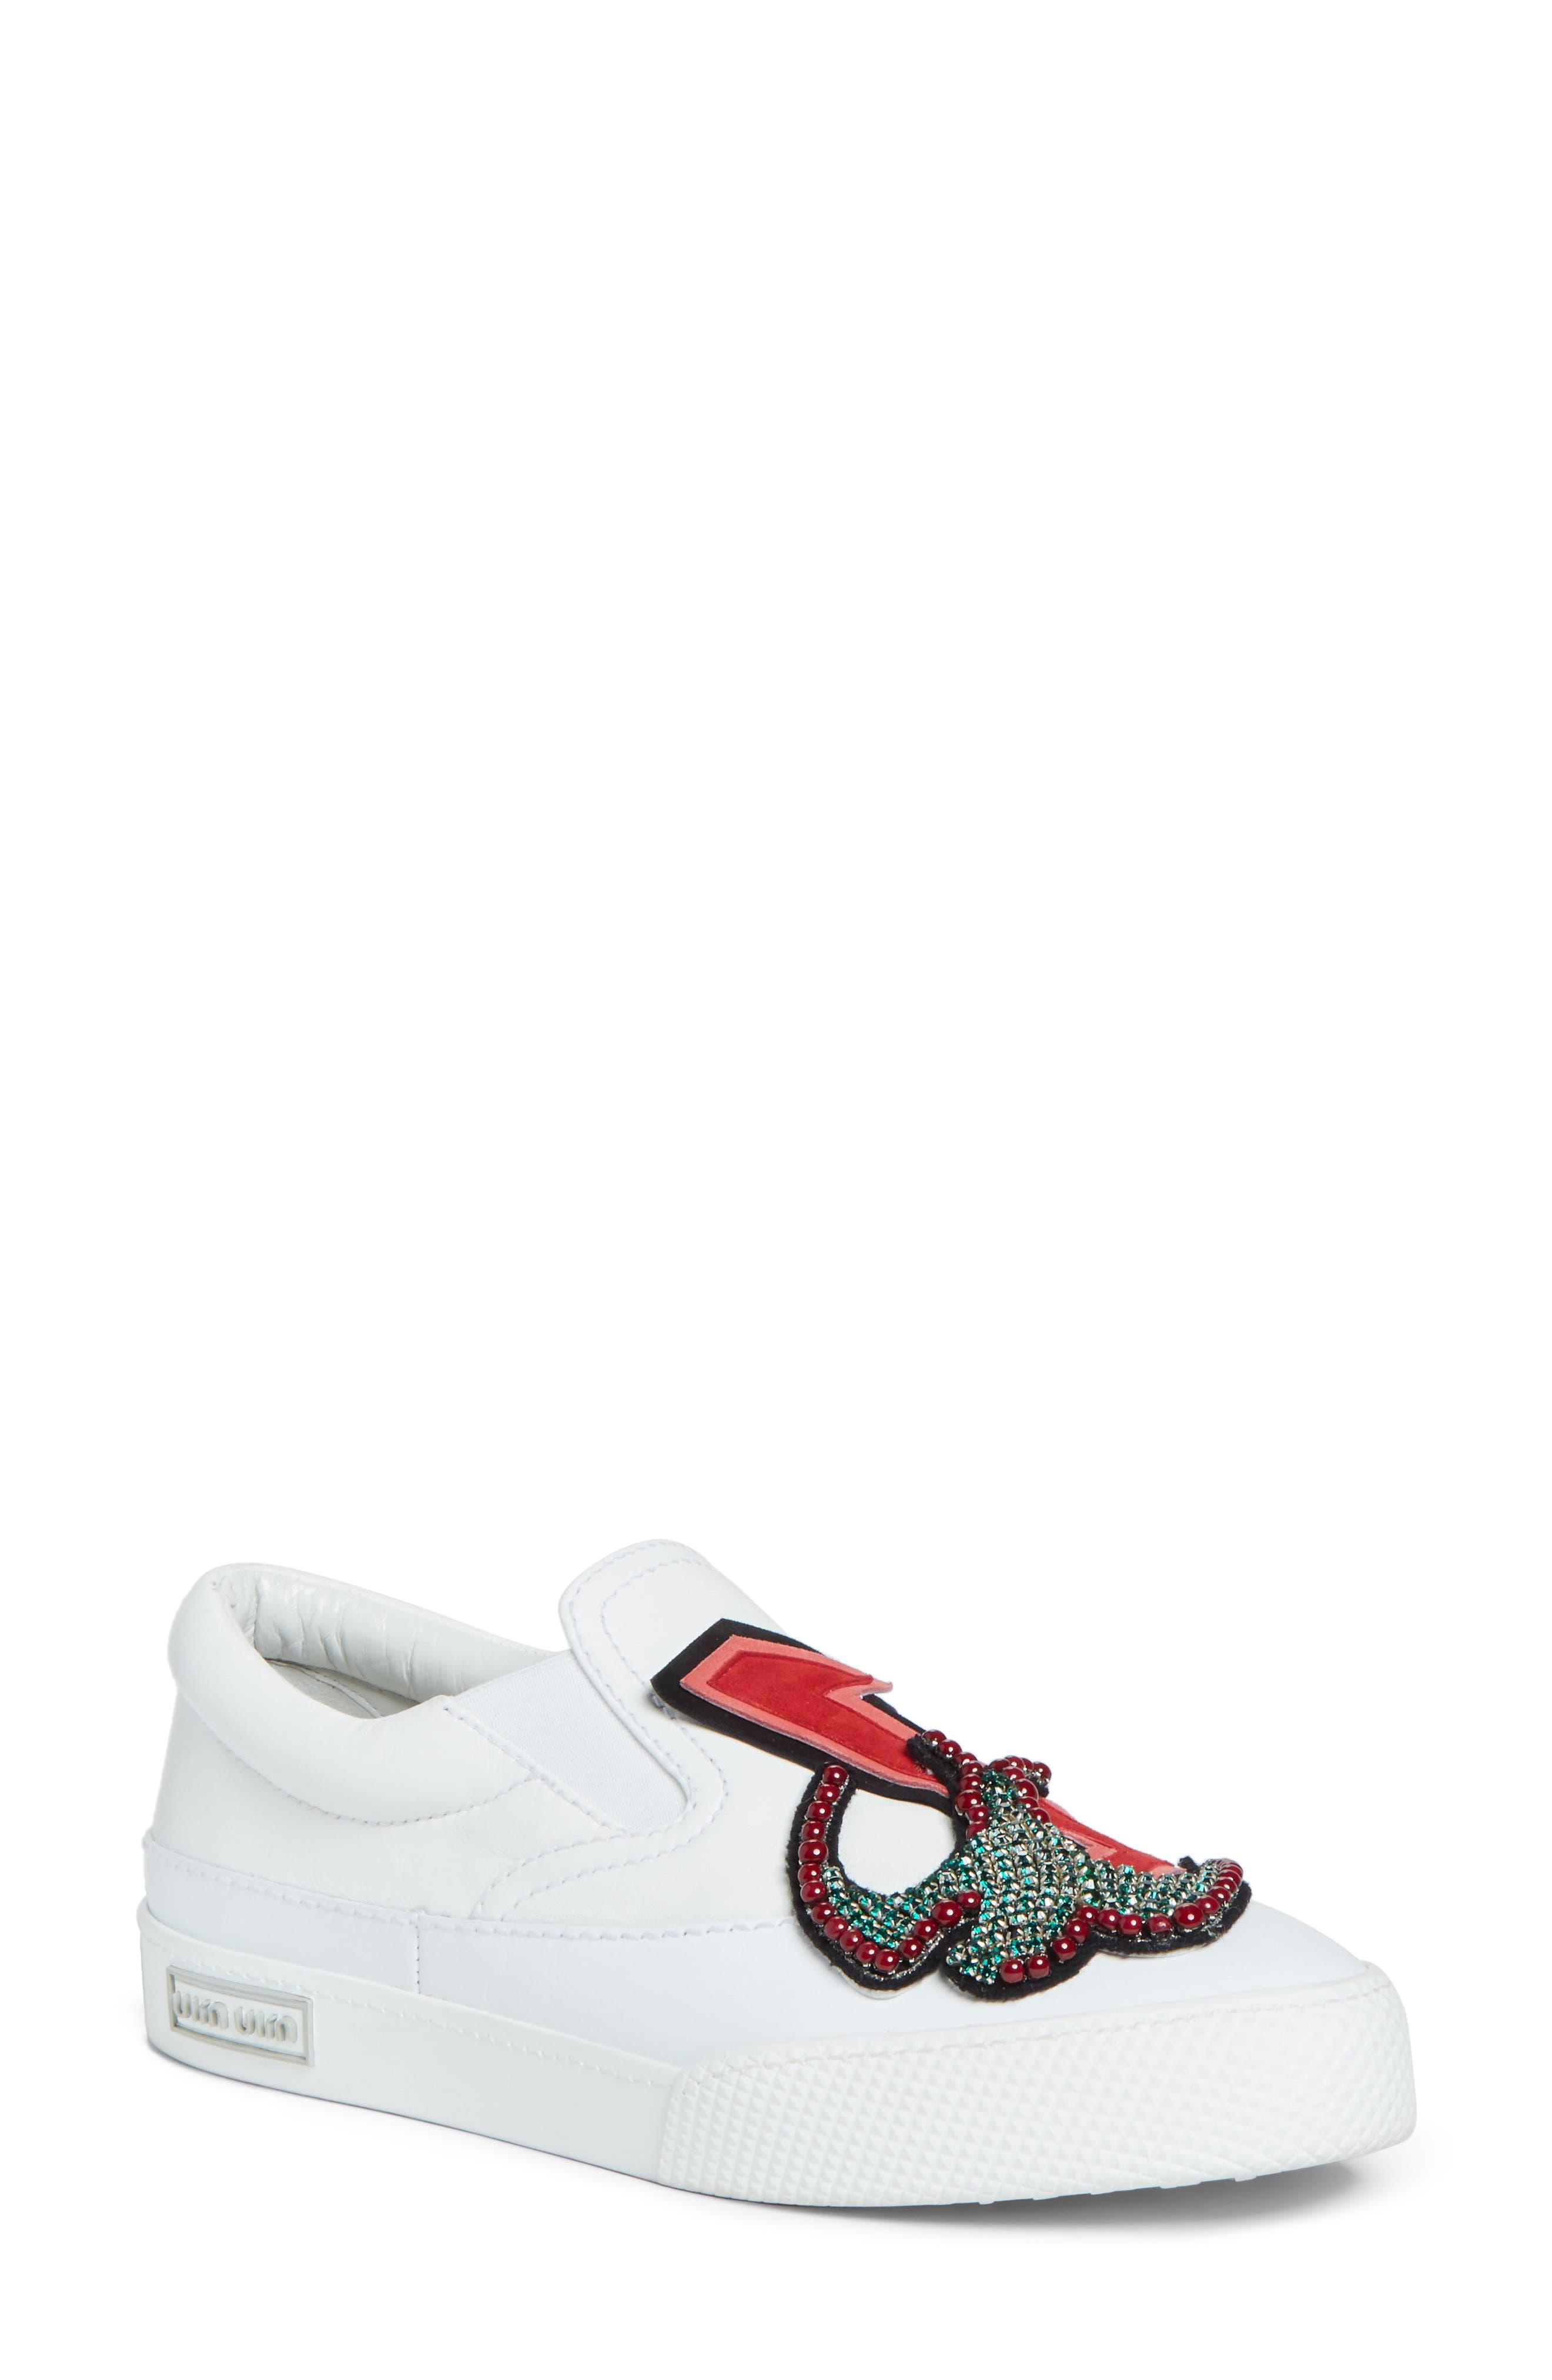 Alternate Image 1 Selected - Miu Miu Embellished Slip-On Sneaker (Women)